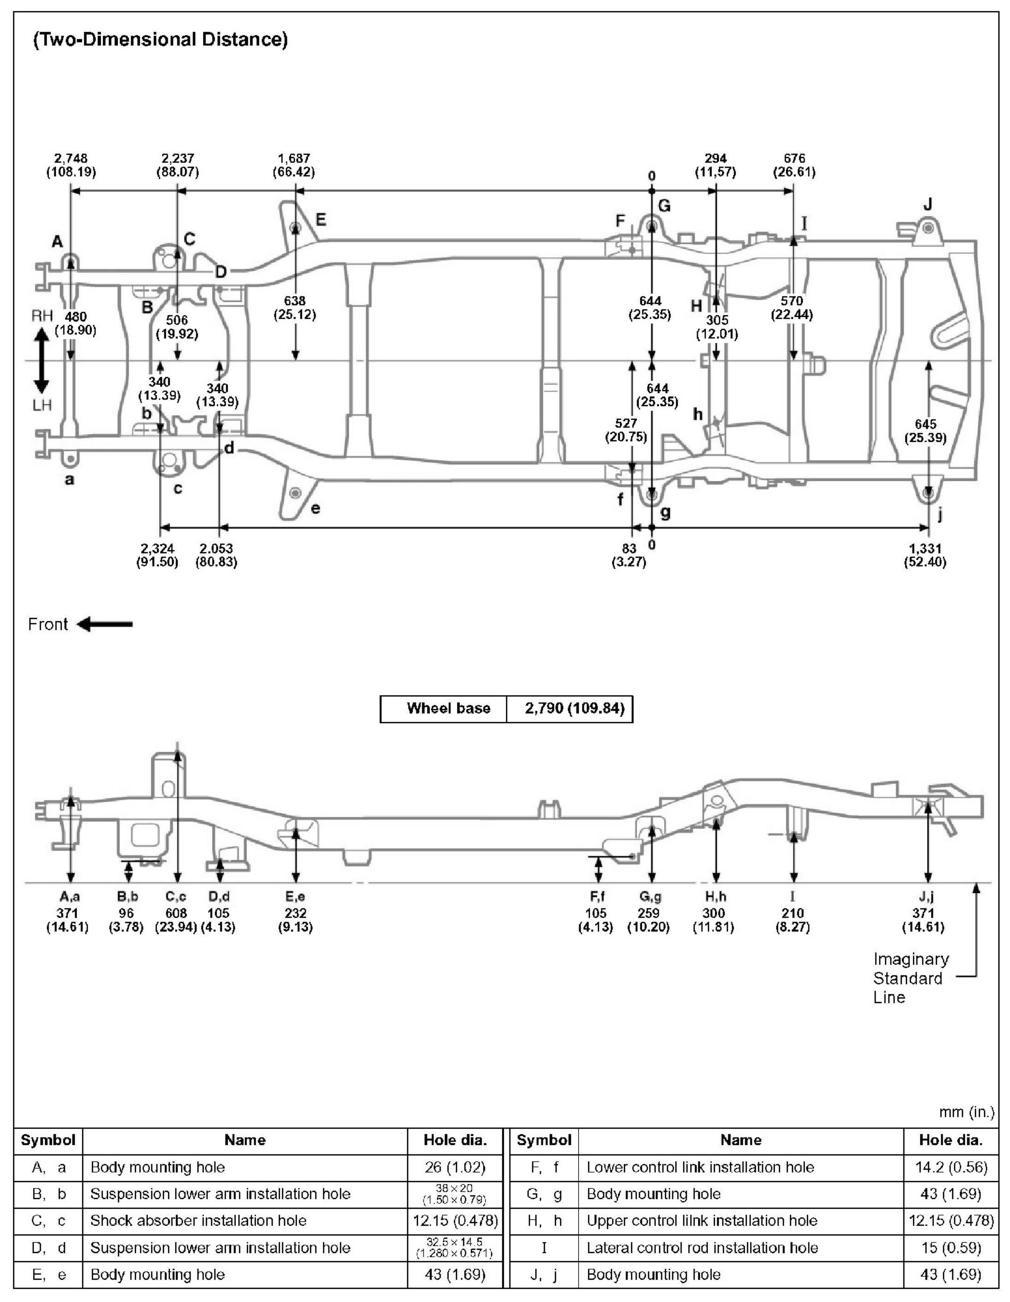 2008 Ford Ranger Frame Schematic Free Vehicle Wiring Diagrams \u2022 2002 Ford  Ranger Transfer Case 2002 Ford Ranger Frame Diagram